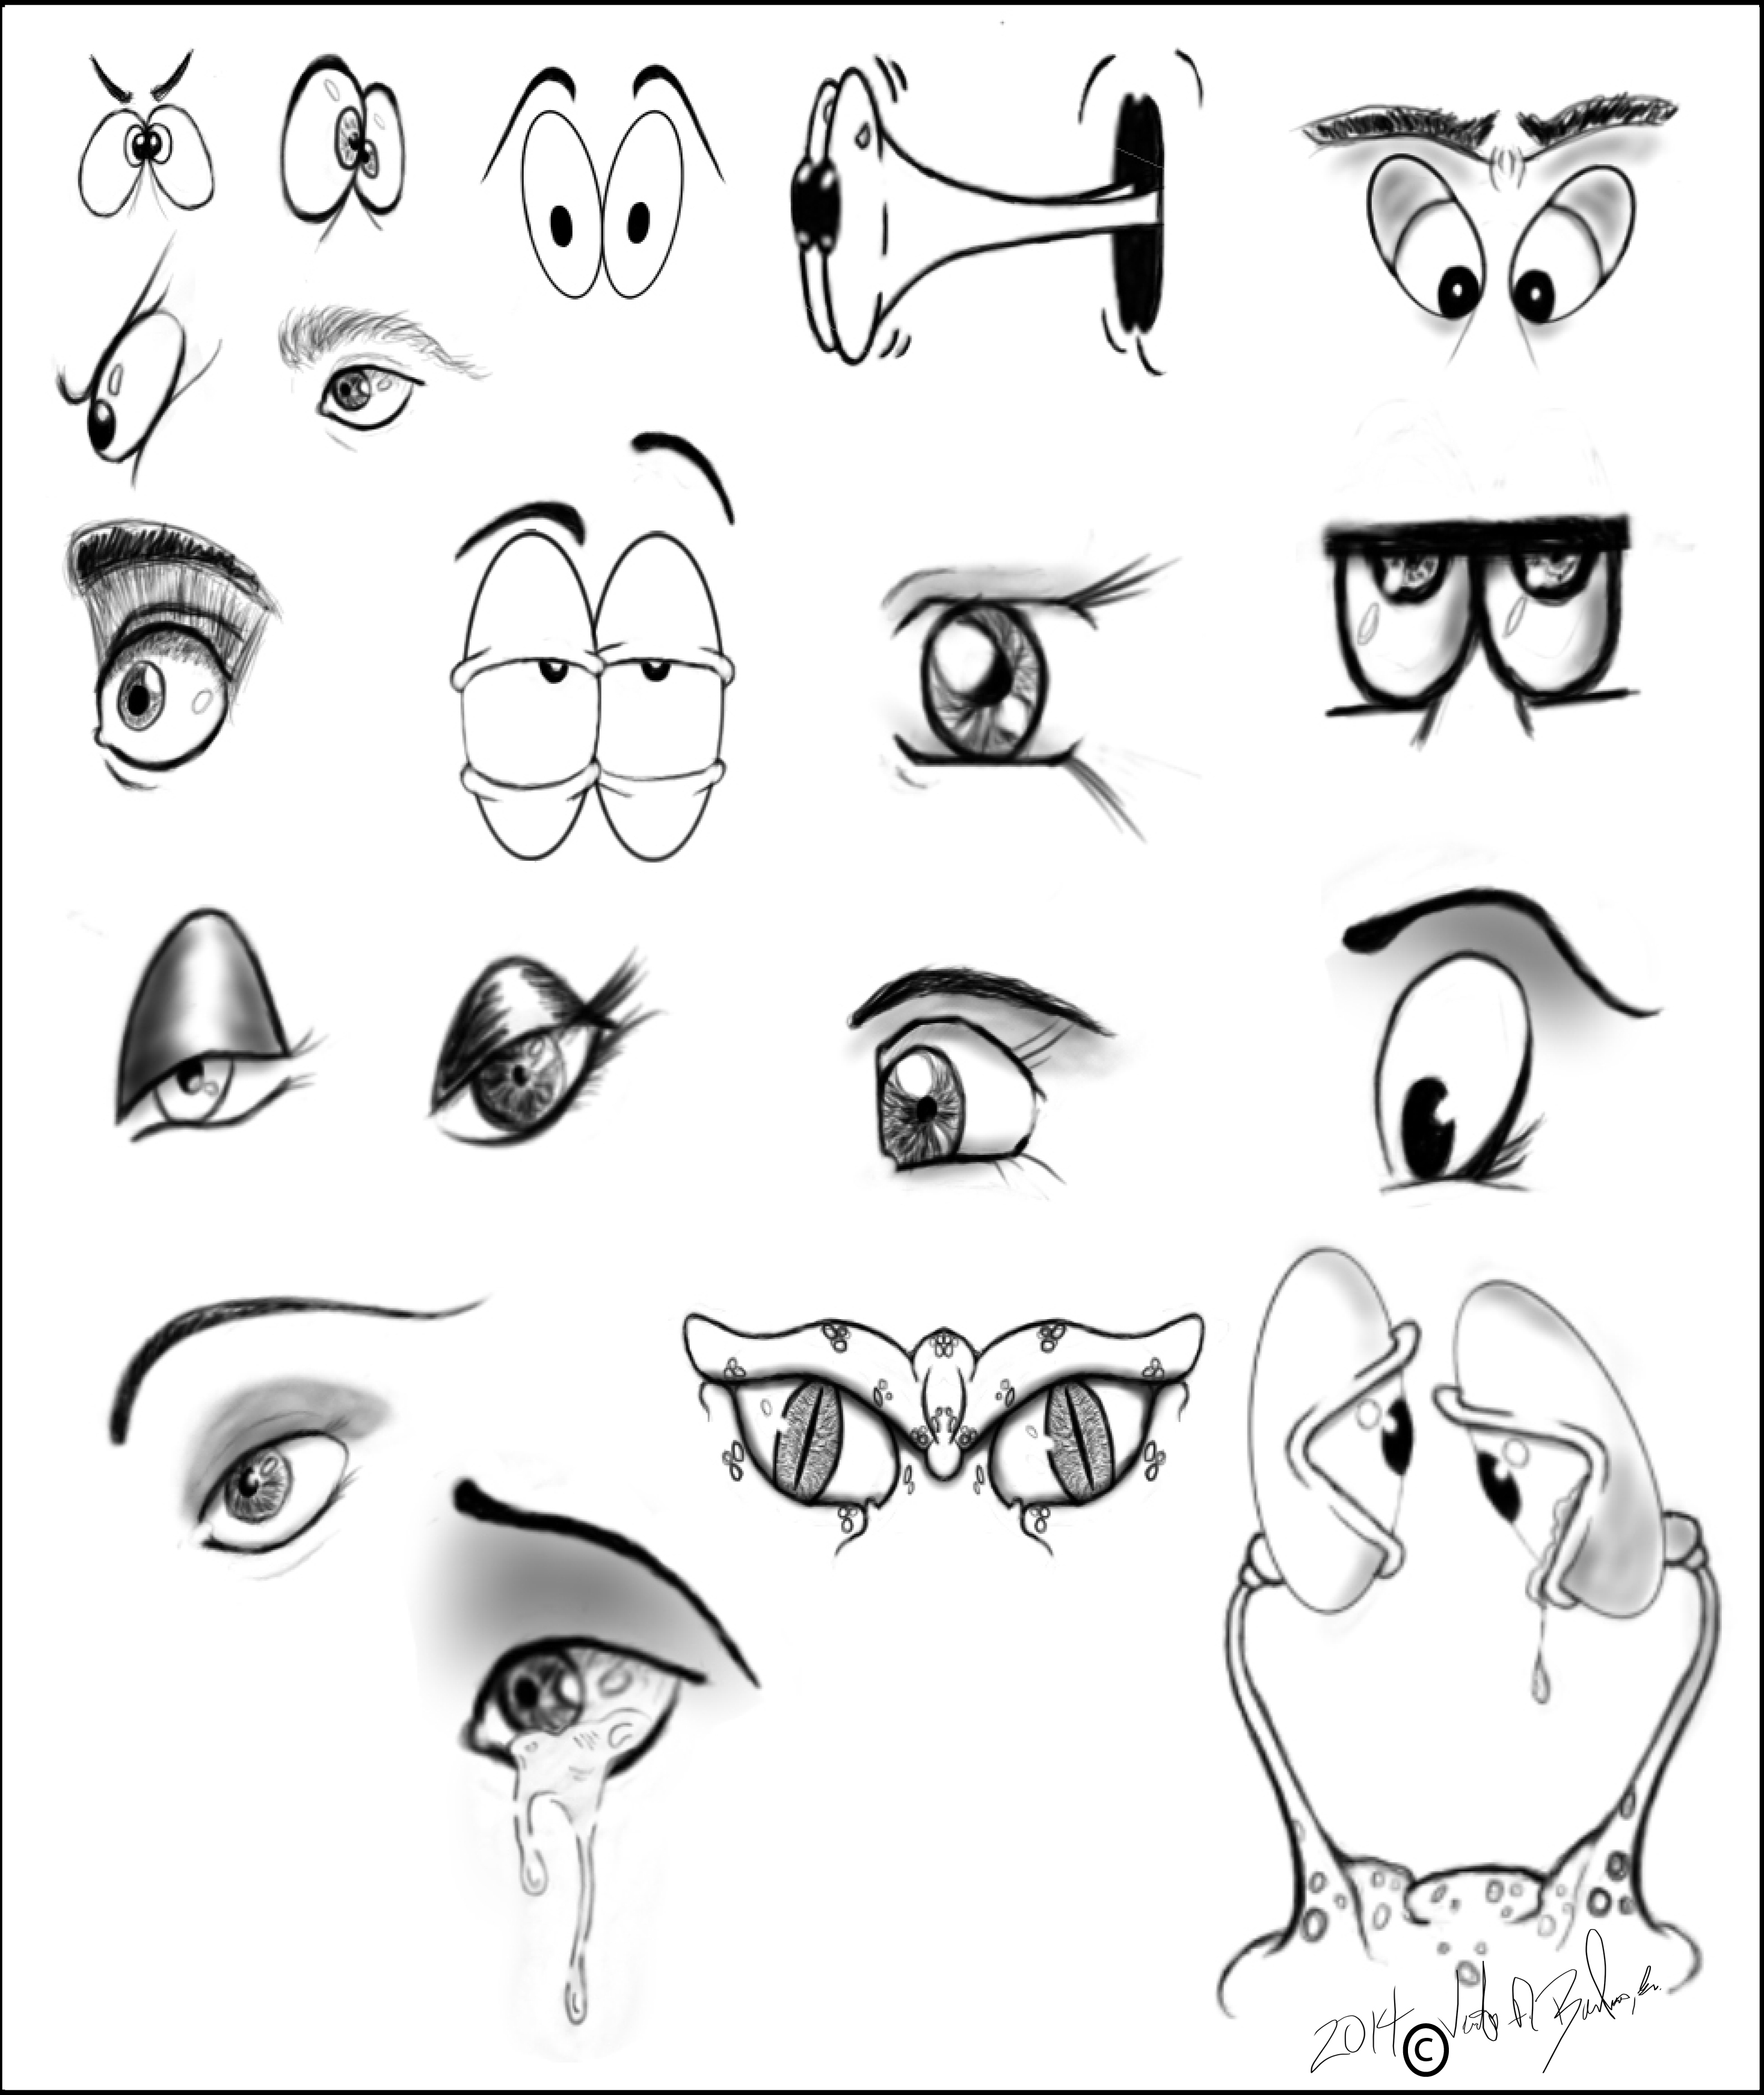 Just some eye balls